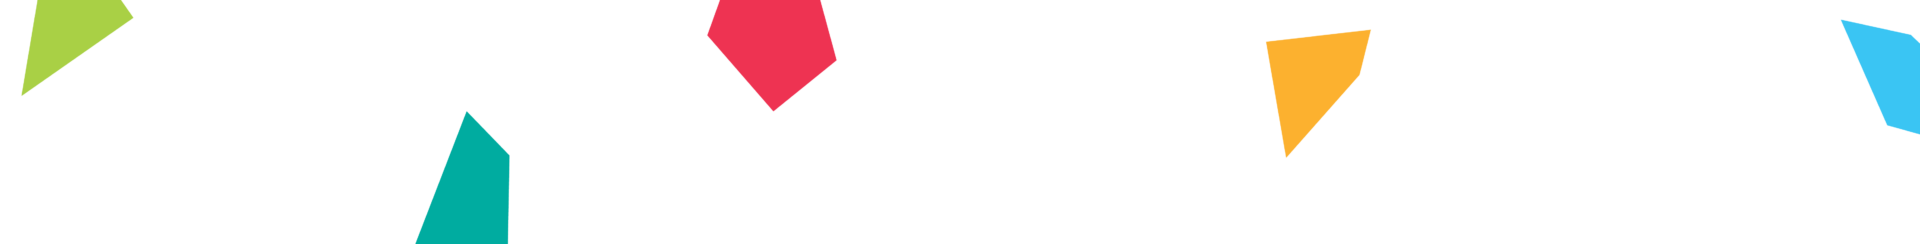 SBB_shapes-05